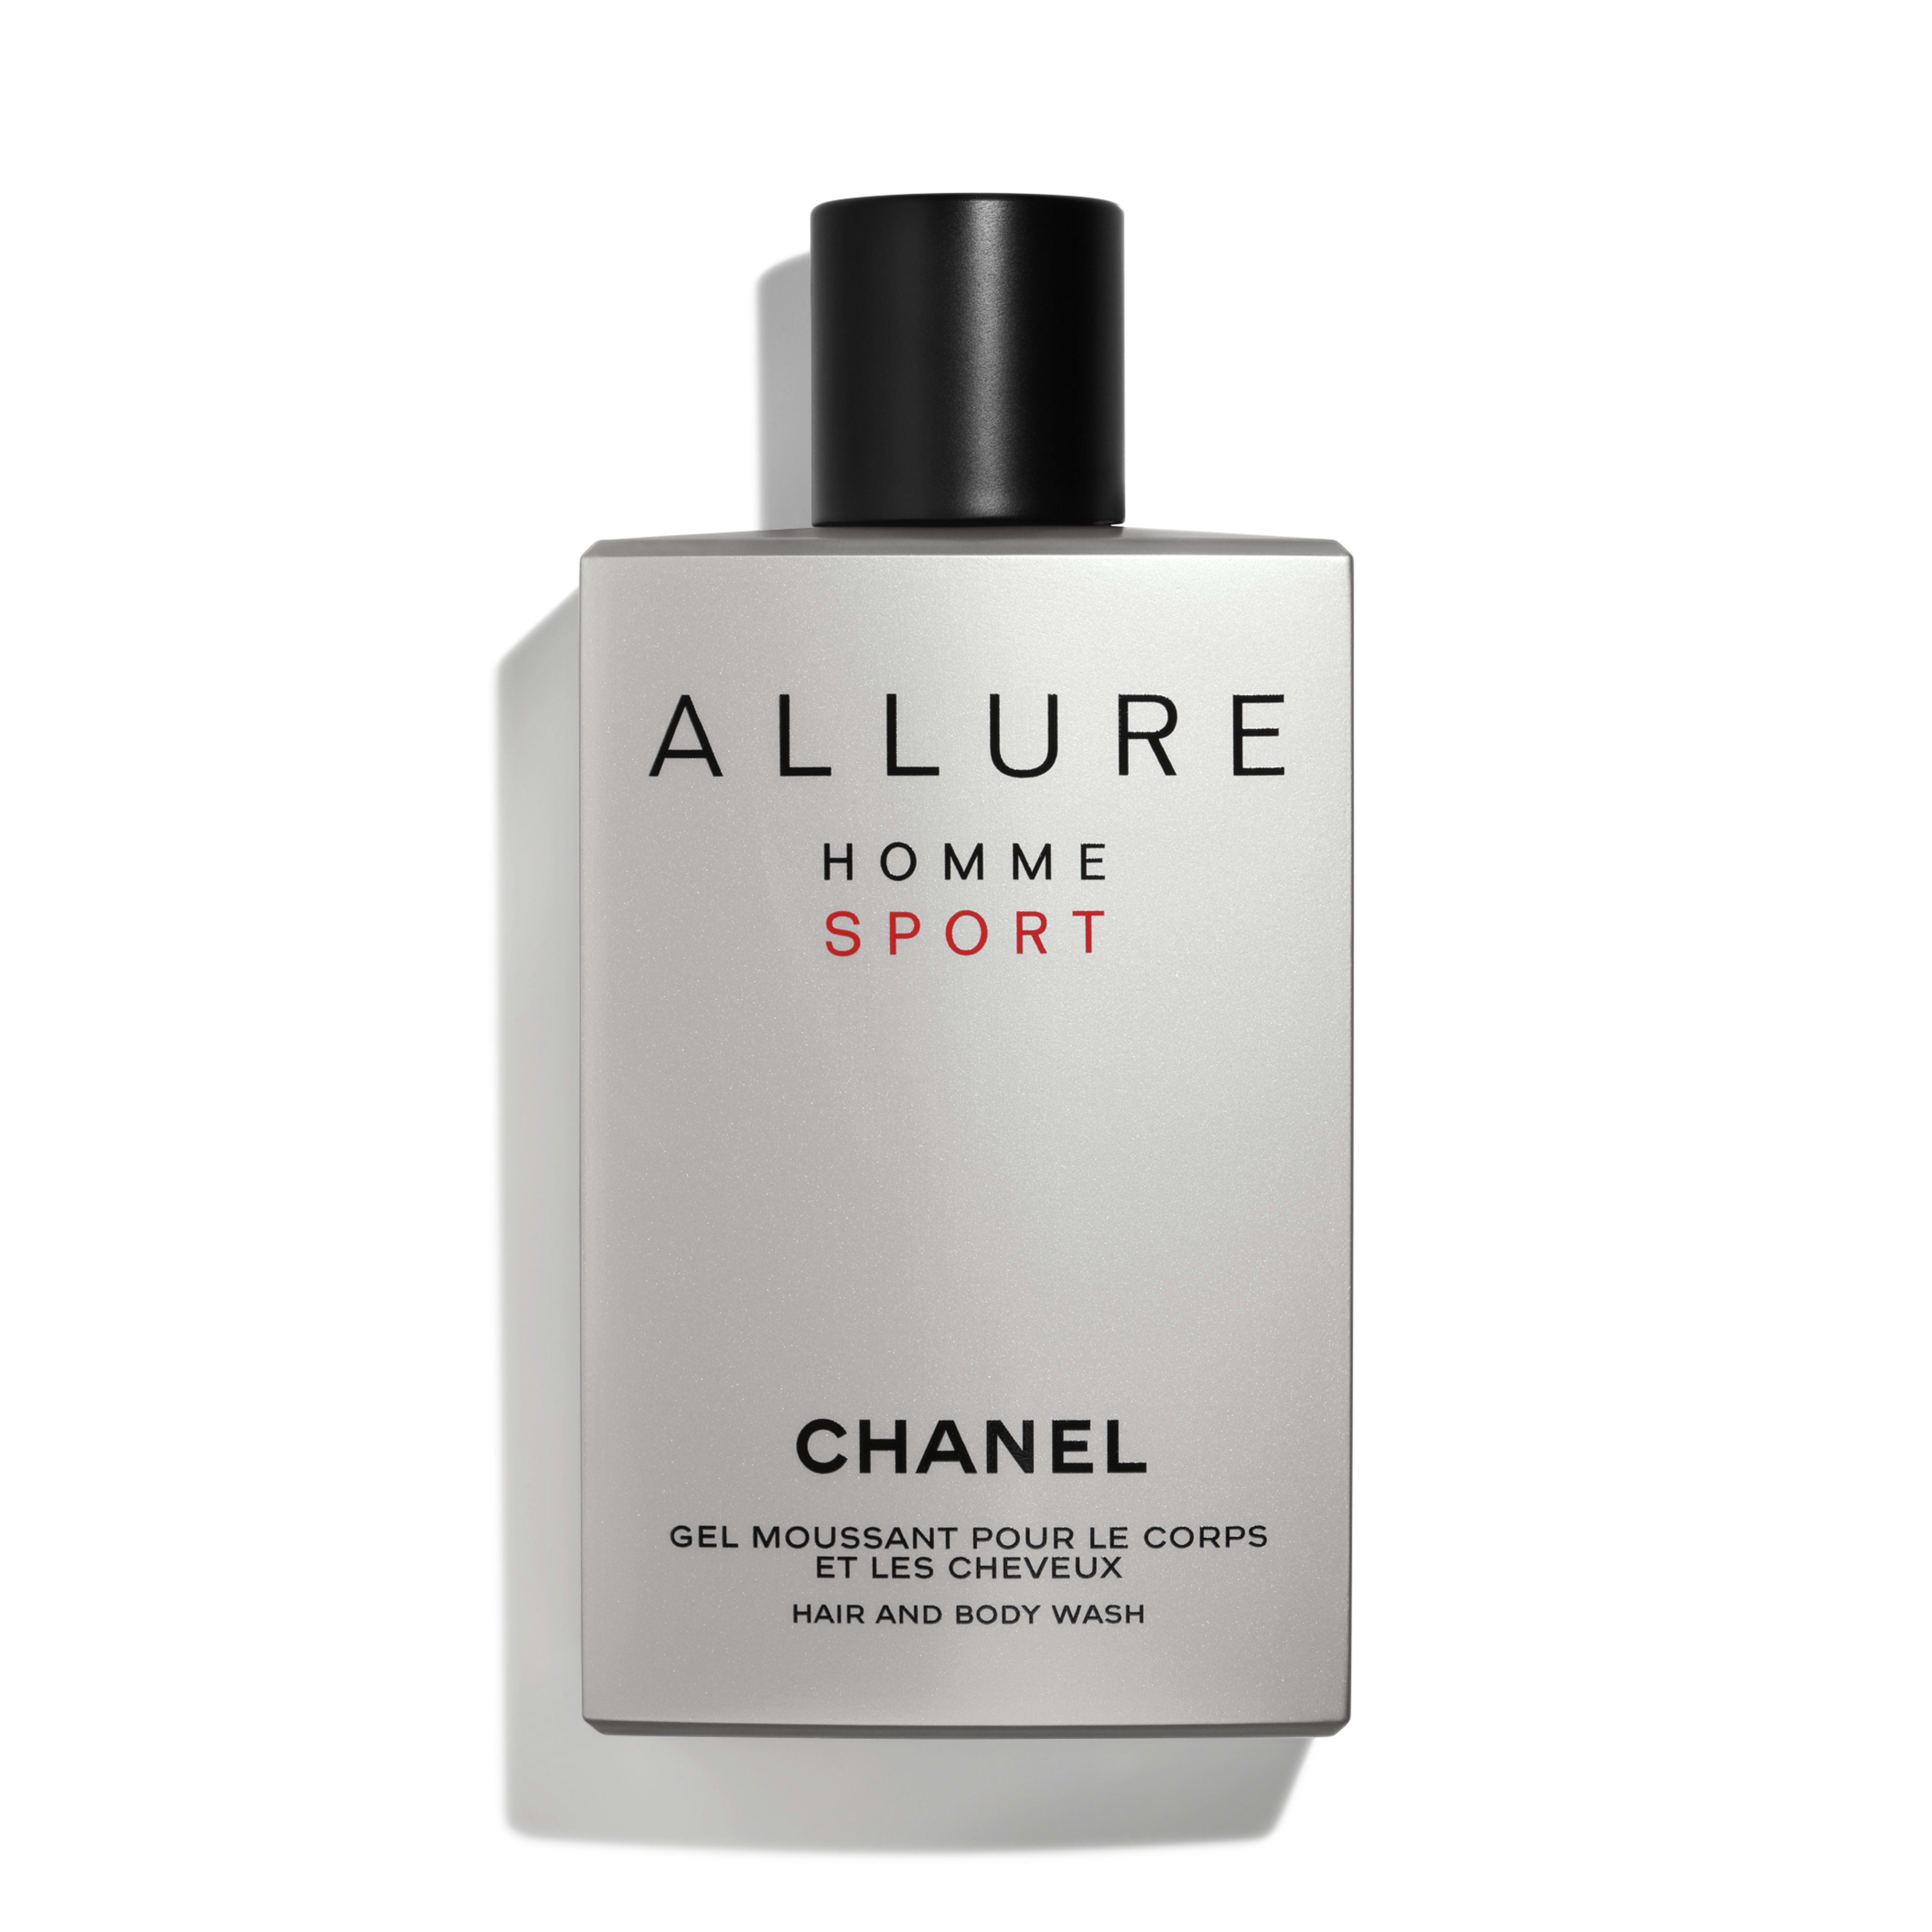 ALLURE HOMME SPORT - fragrance - 200ml - Widok domyślny